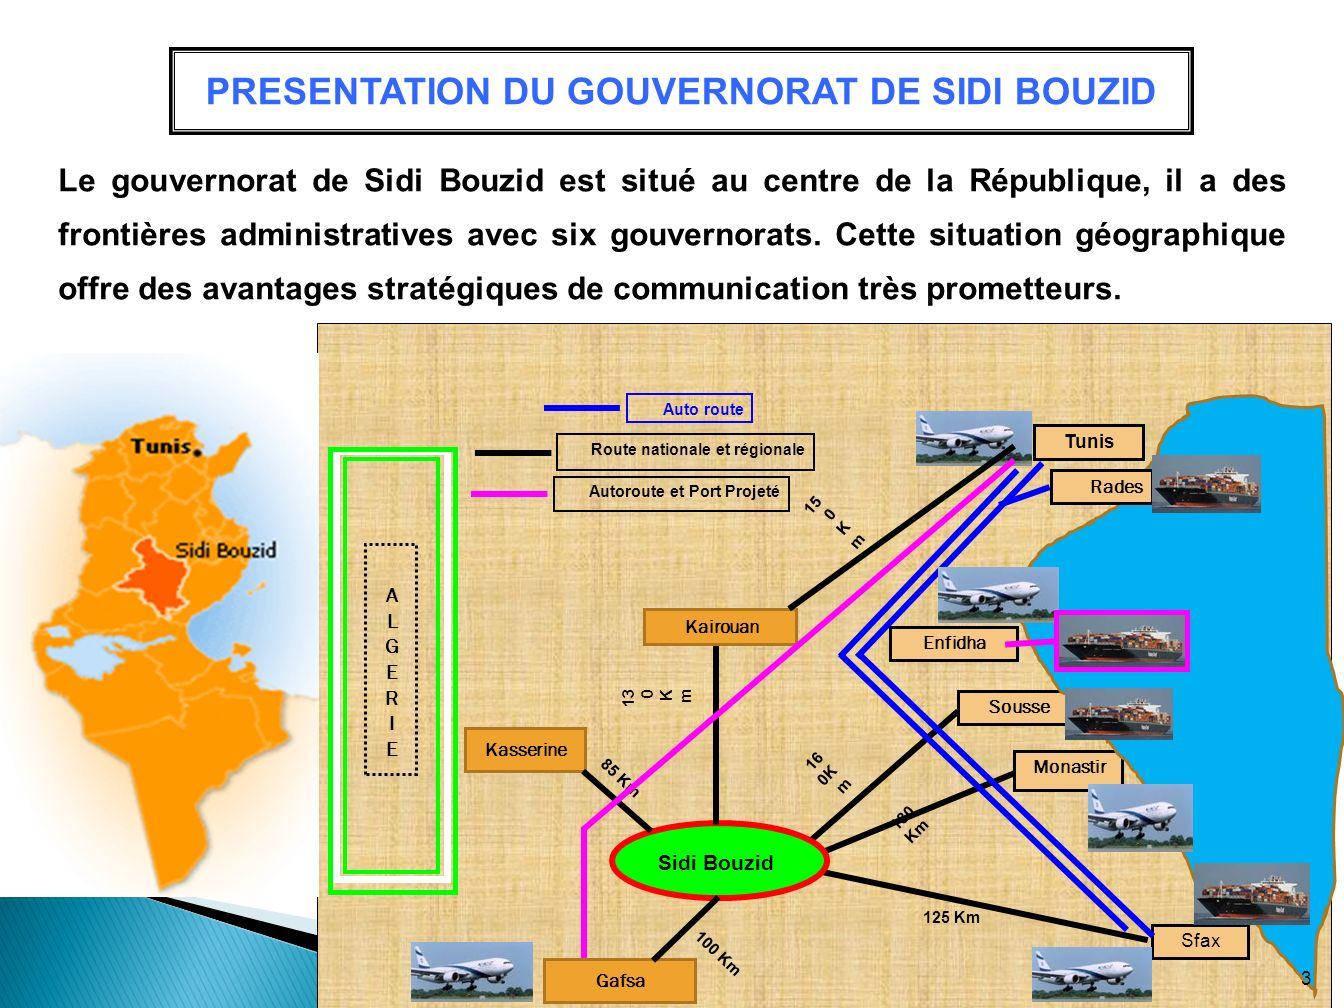 PRESENTATION DU GOUVERNORAT DE SIDI BOUZID